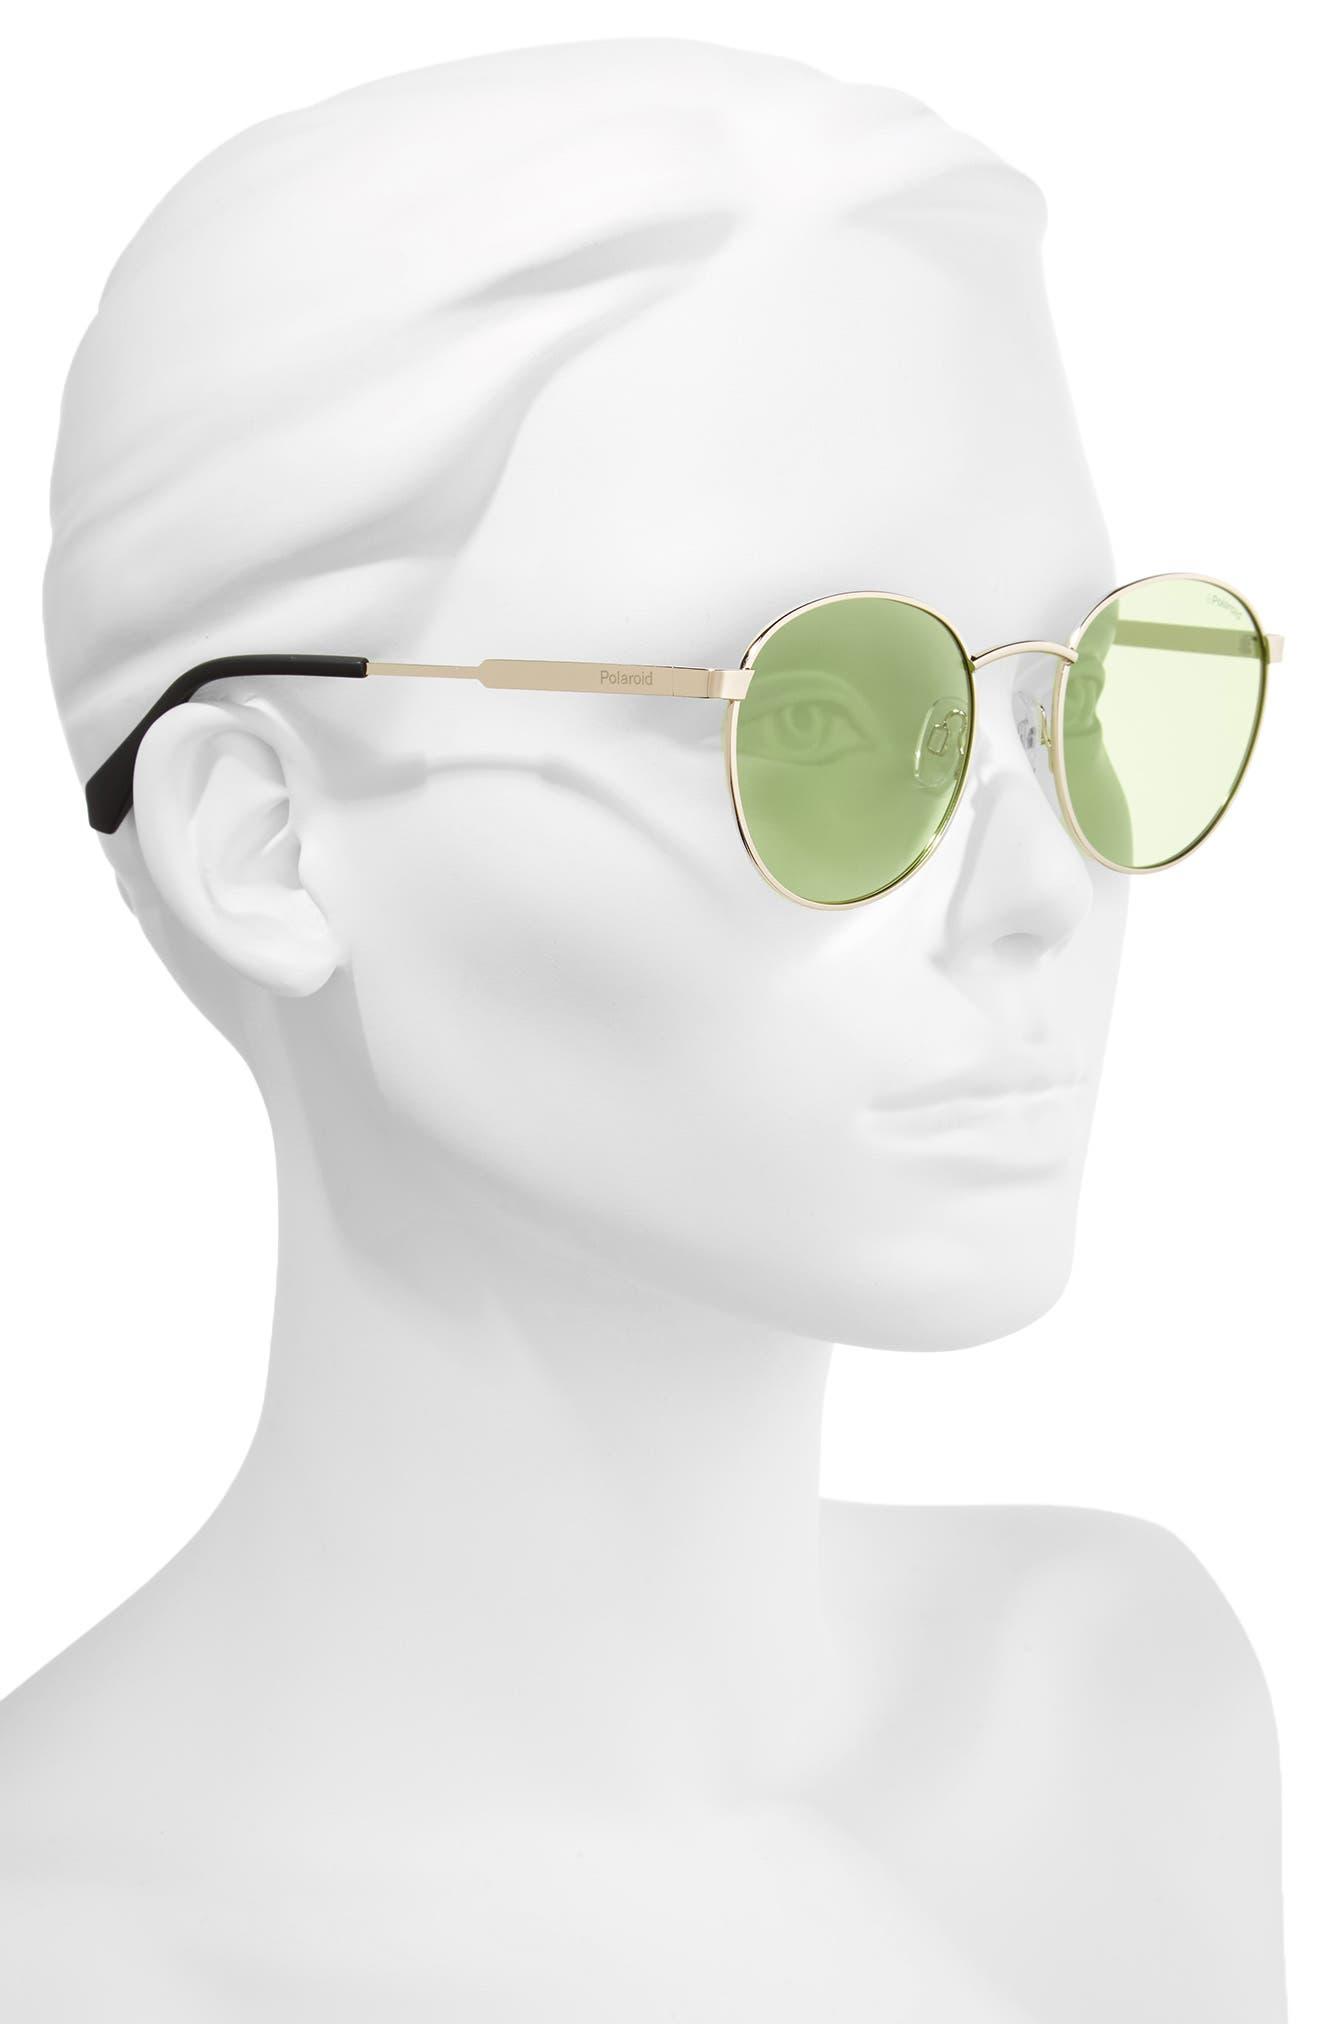 51mm Round Retro Polarized Sunglasses,                             Alternate thumbnail 2, color,                             Green